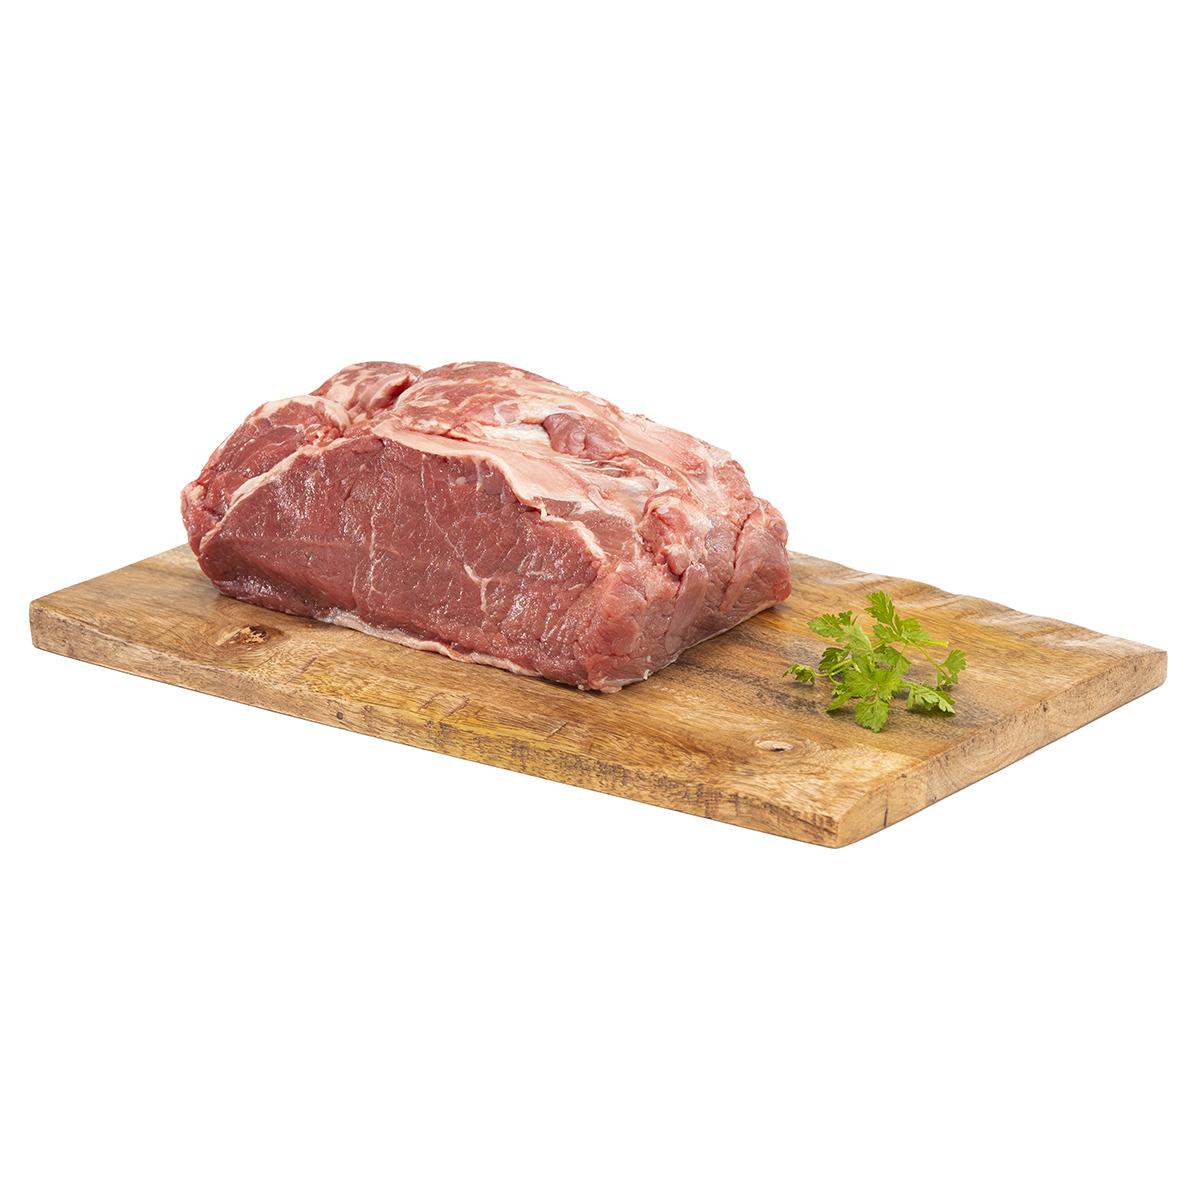 Roast-beef Bovino carne italiana di prima qualità vendita online